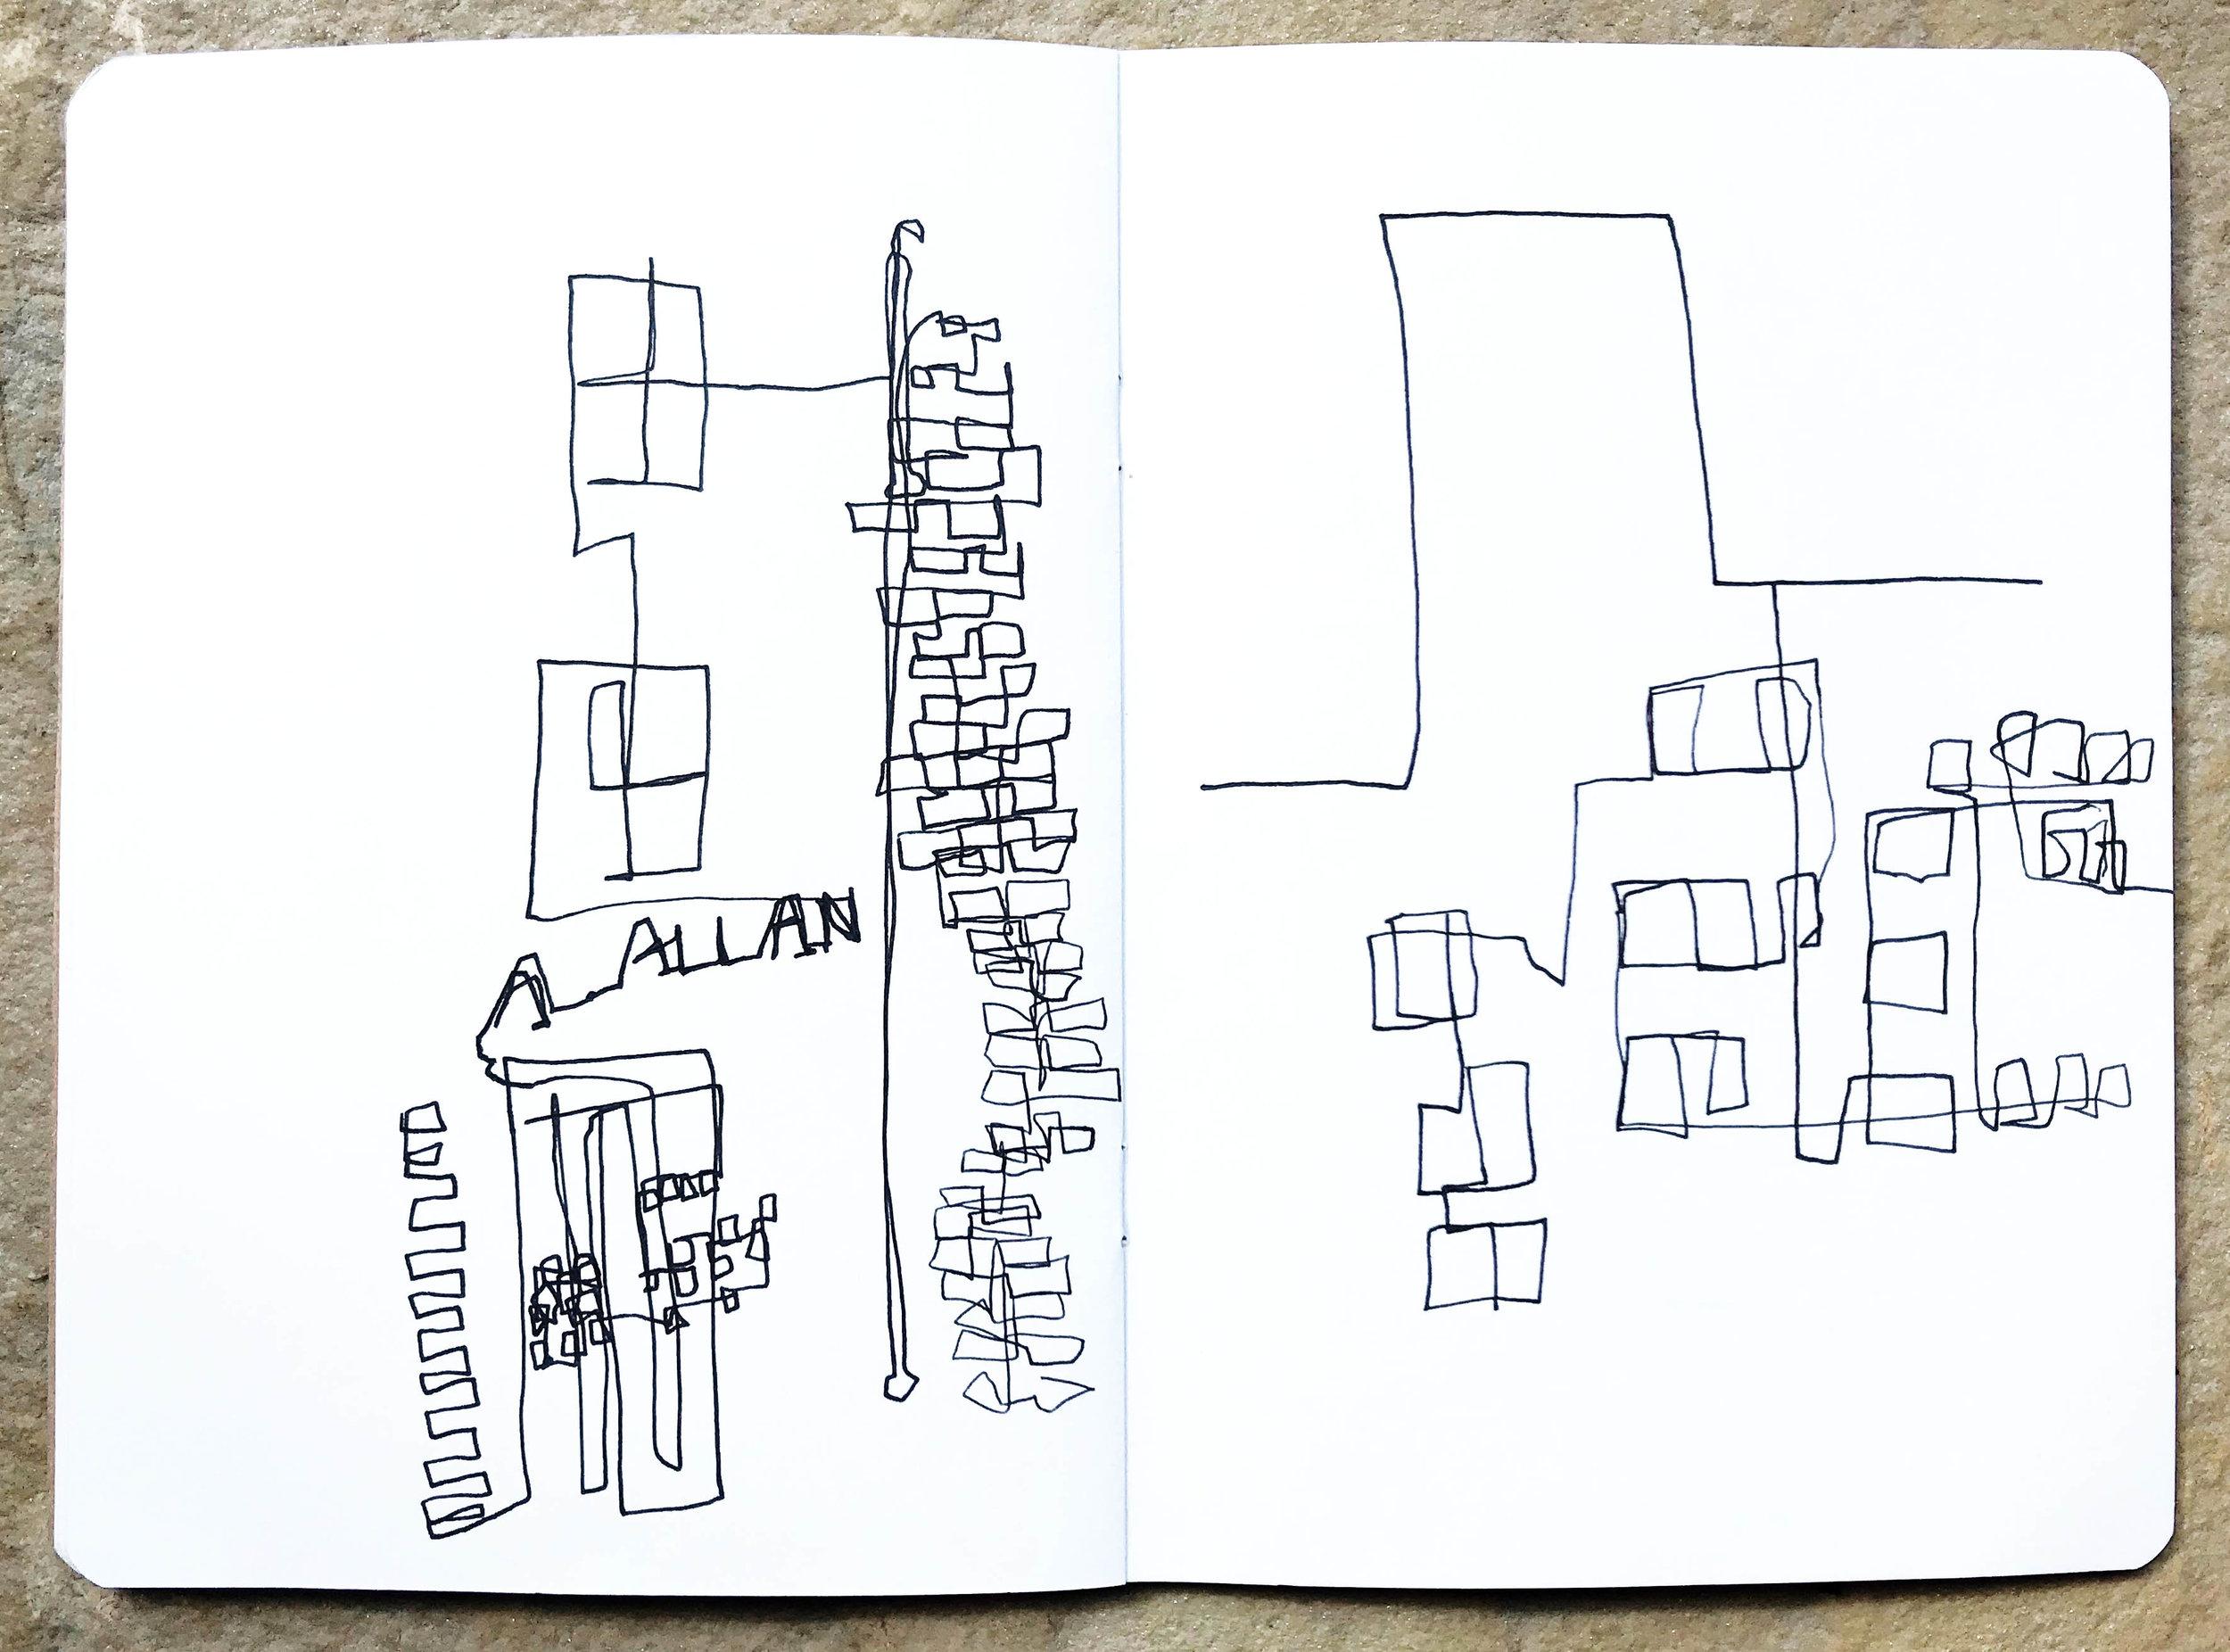 Stuco sketching 03 Holly Sharpe.jpg